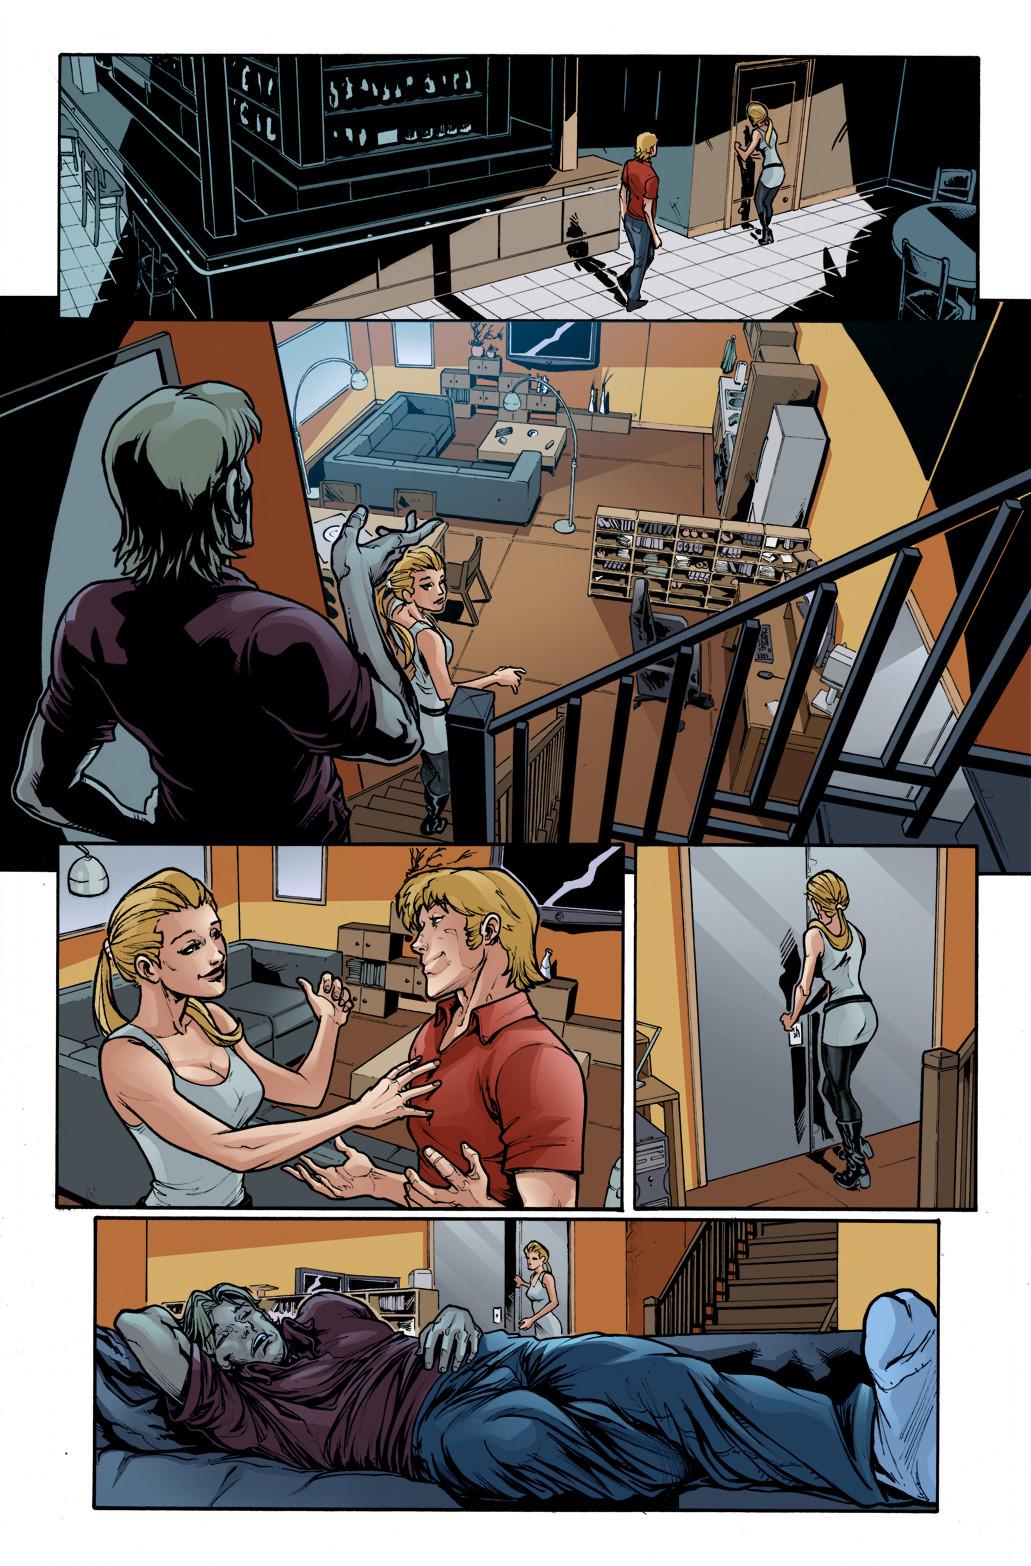 3 GUNS - #1, page 20